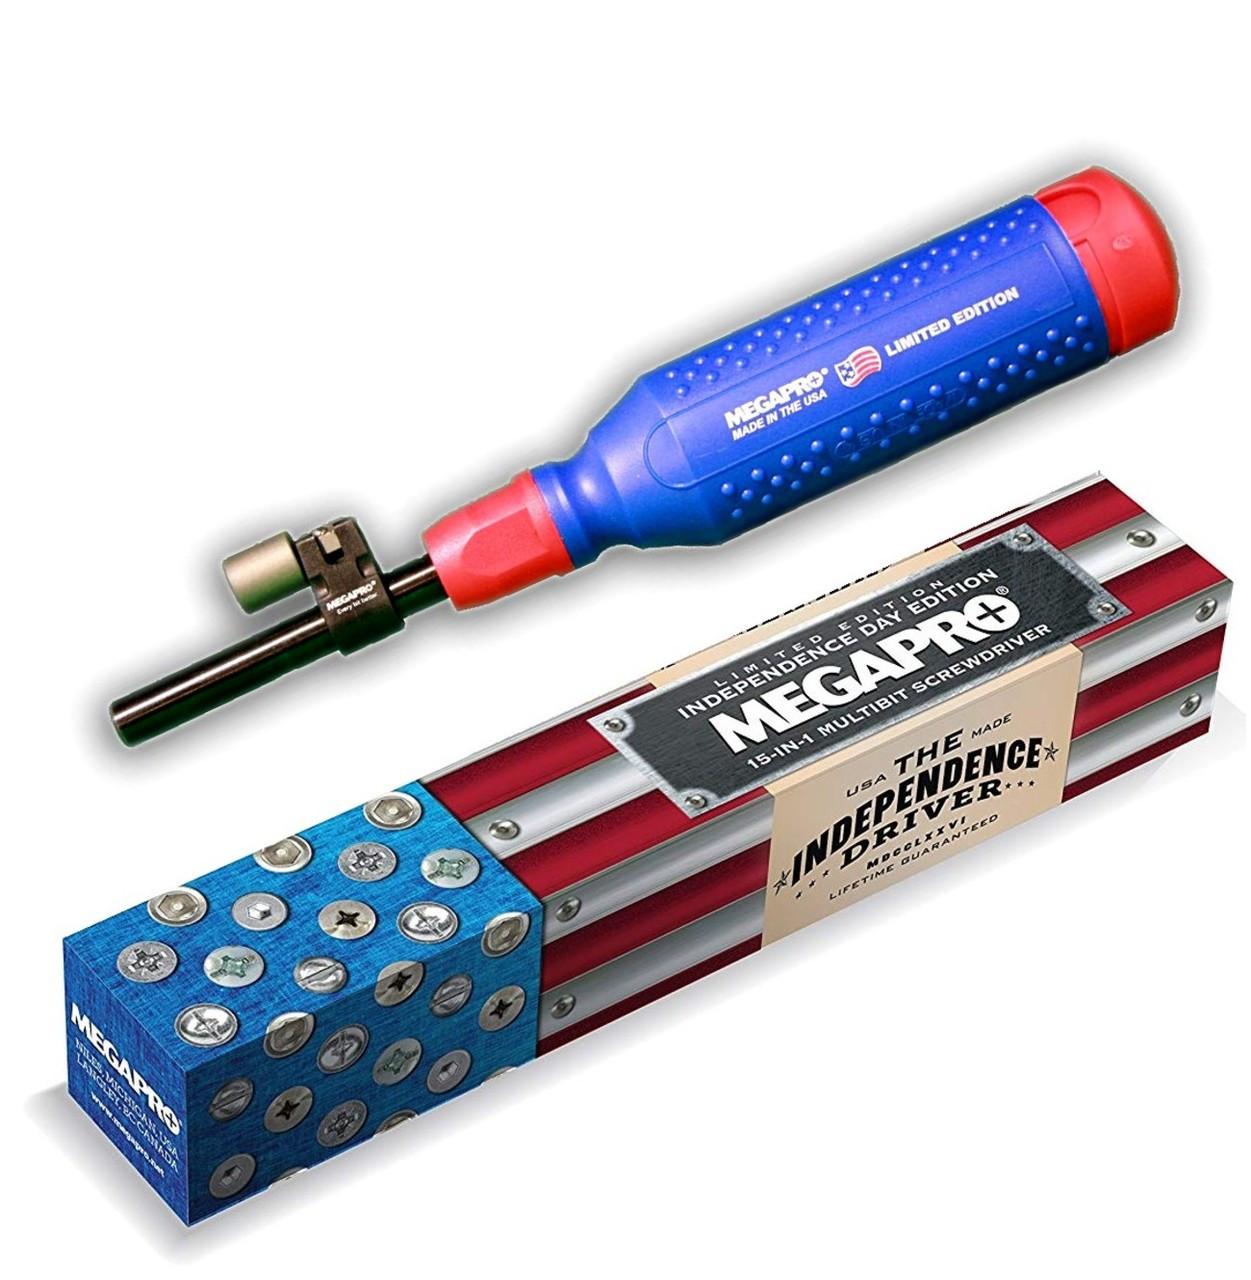 Megapro Original 15 in 1 Multi Bit Screwdriver Phillips Torx LIMITED EDITION USA